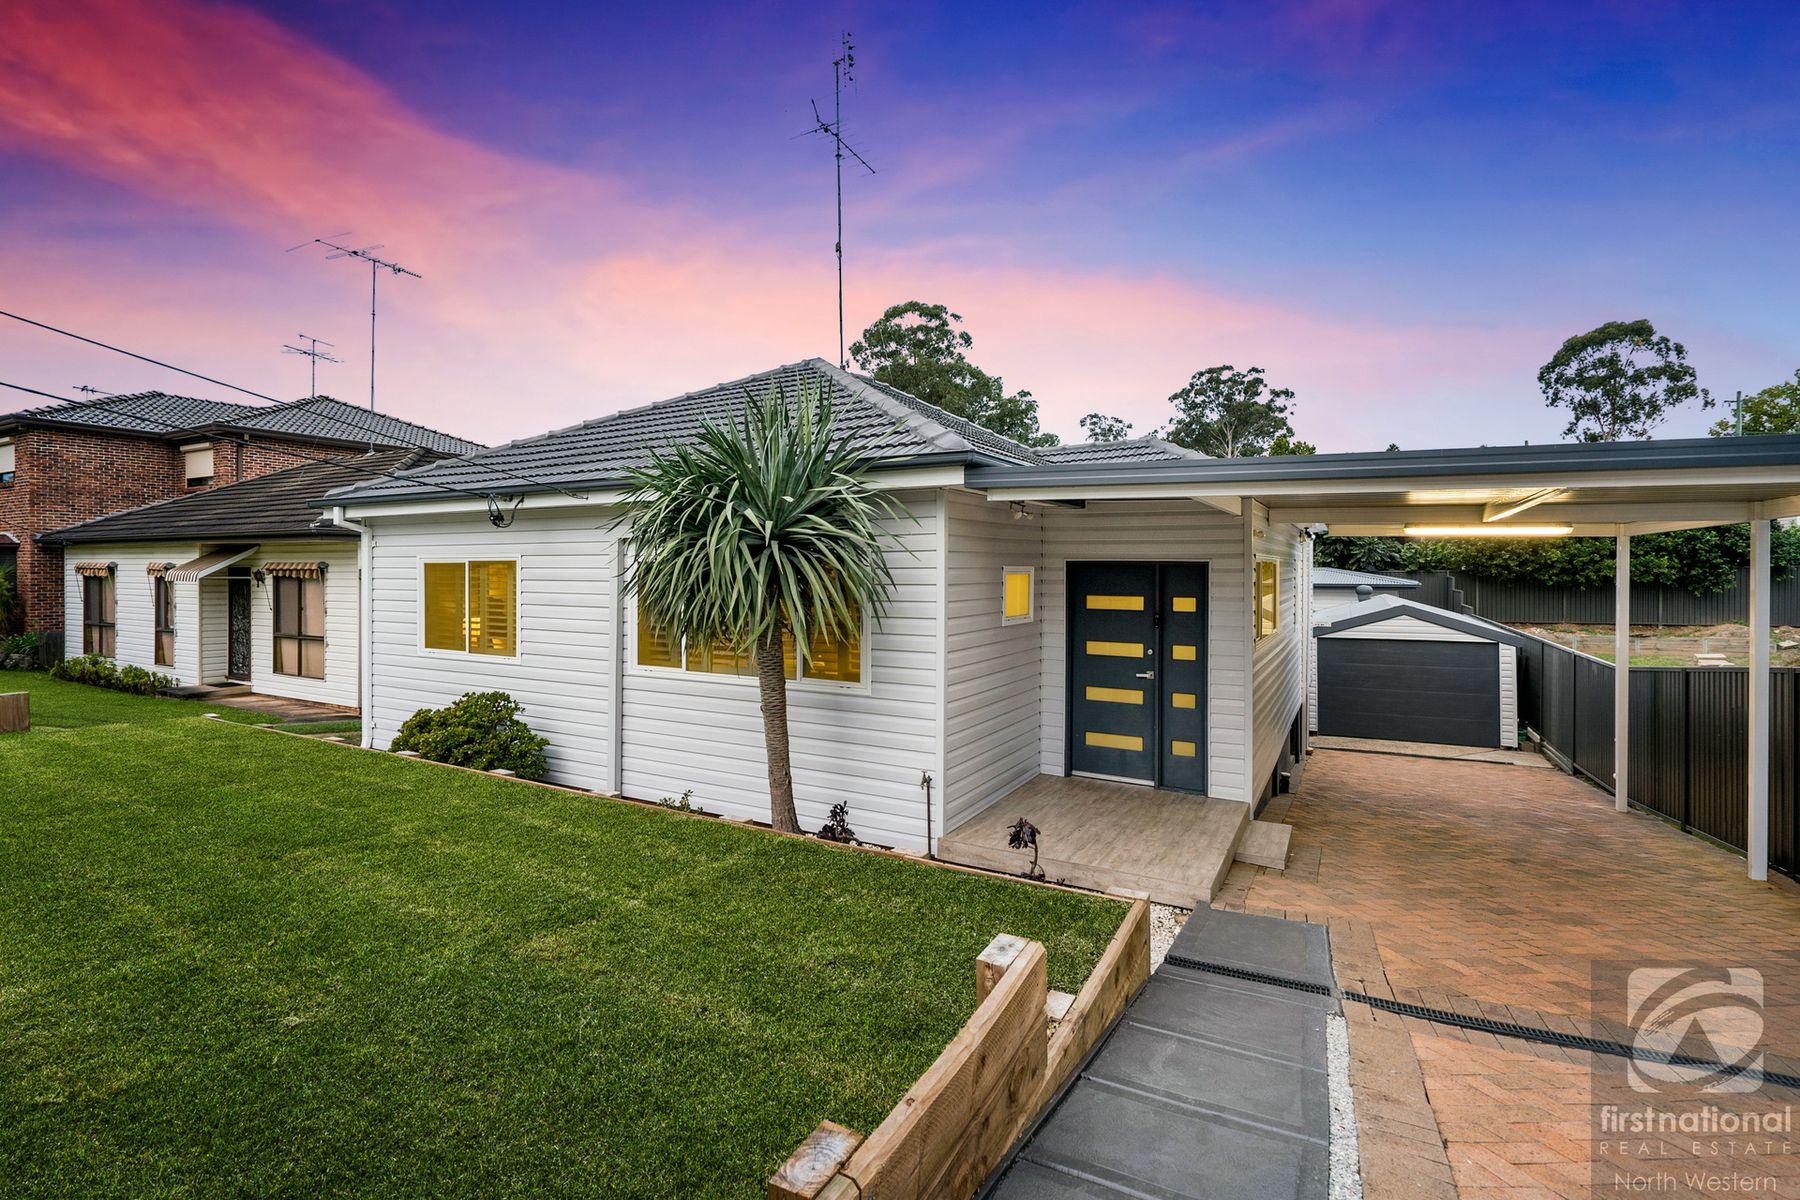 3 Lennox Street, Old Toongabbie, NSW 2146